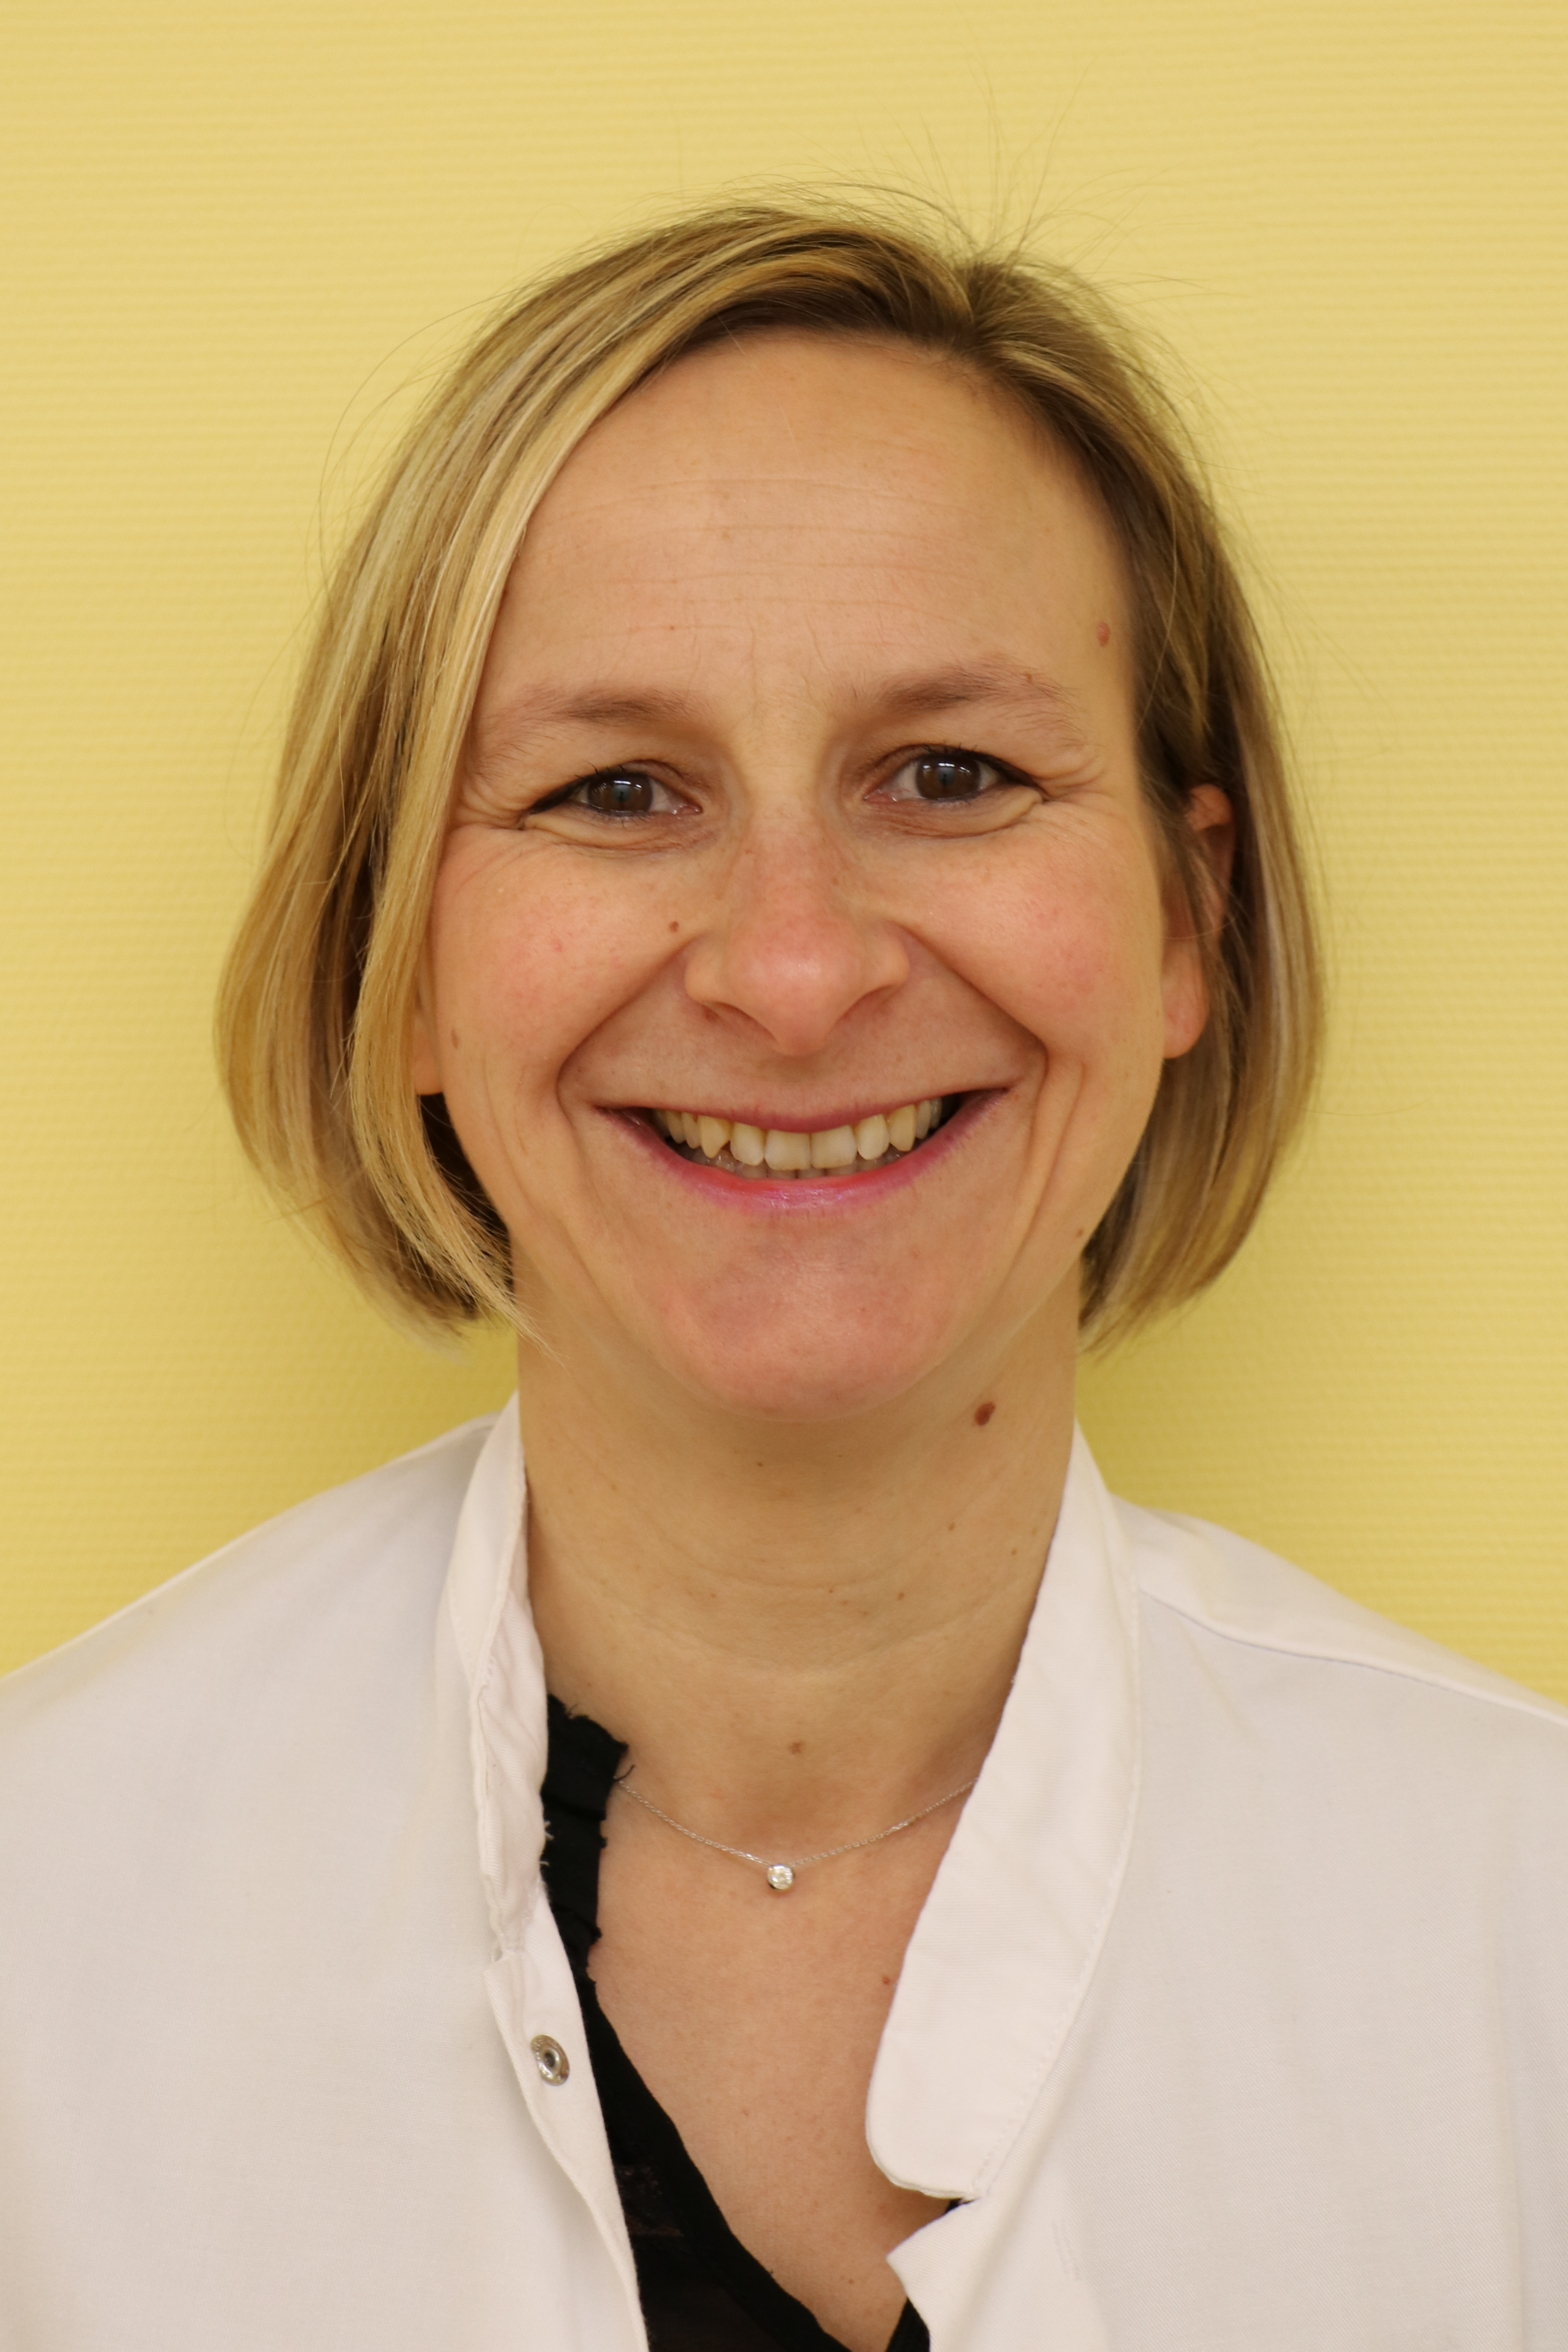 Dr Carole FRANCESCHINI-ANDRE